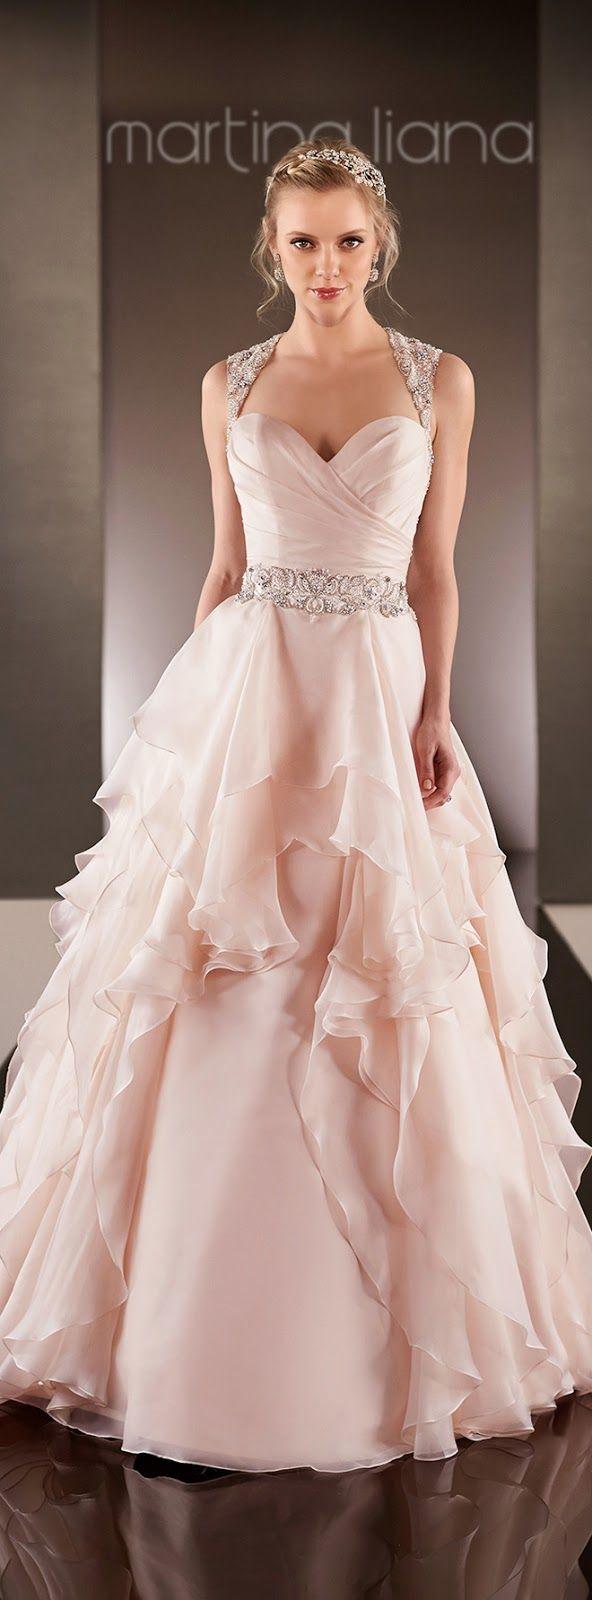 Martina Liana Spring 2015 Bridal Collection   bellethemagazine.com